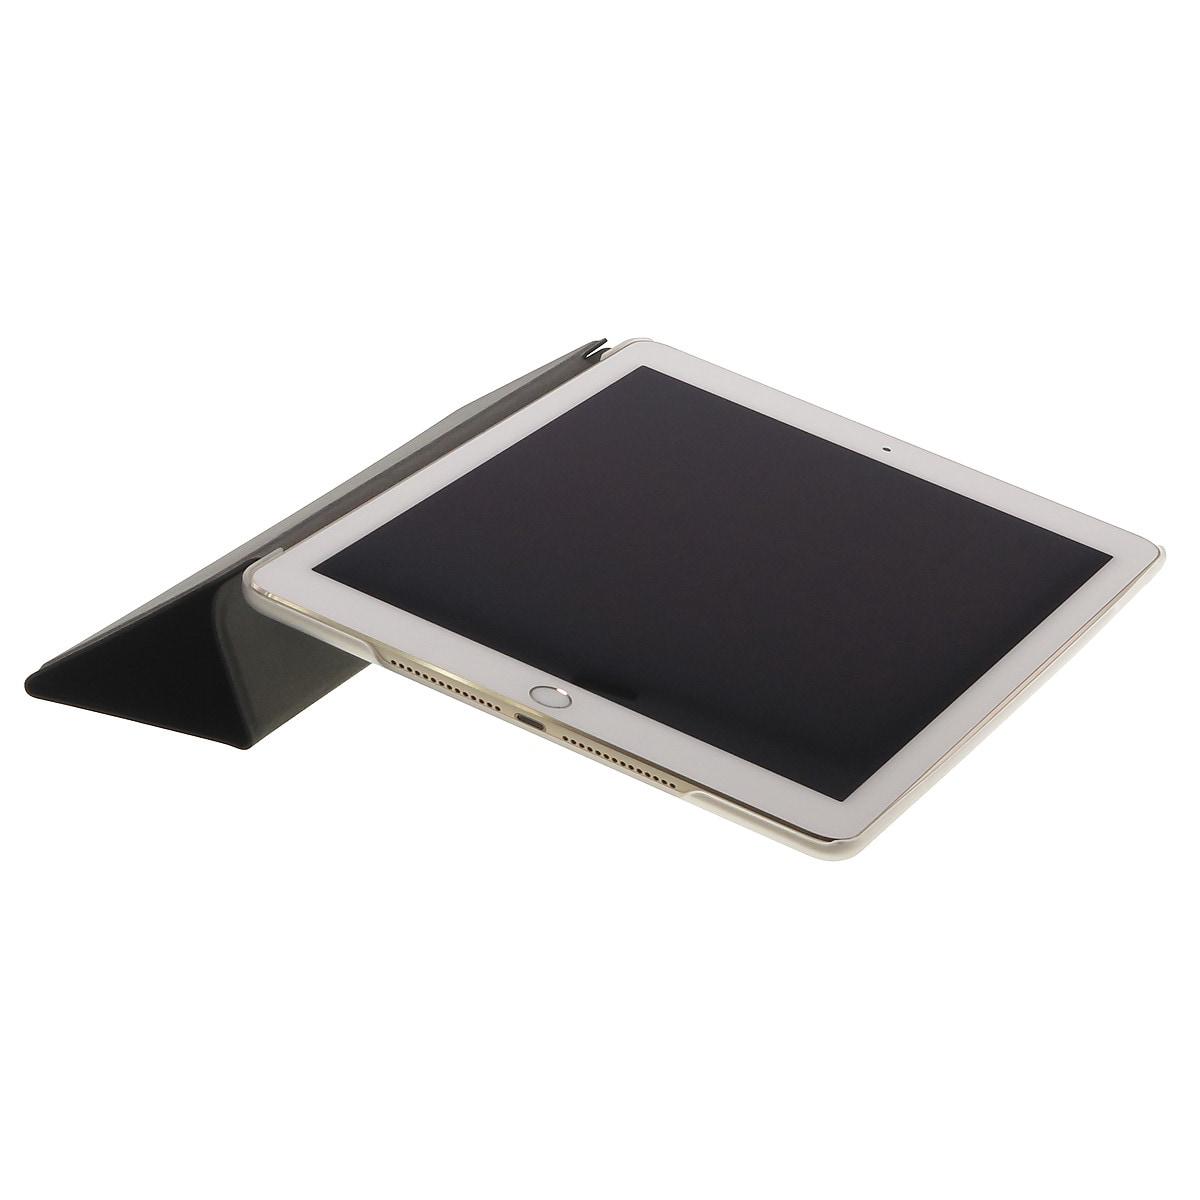 Case for iPad Air 2